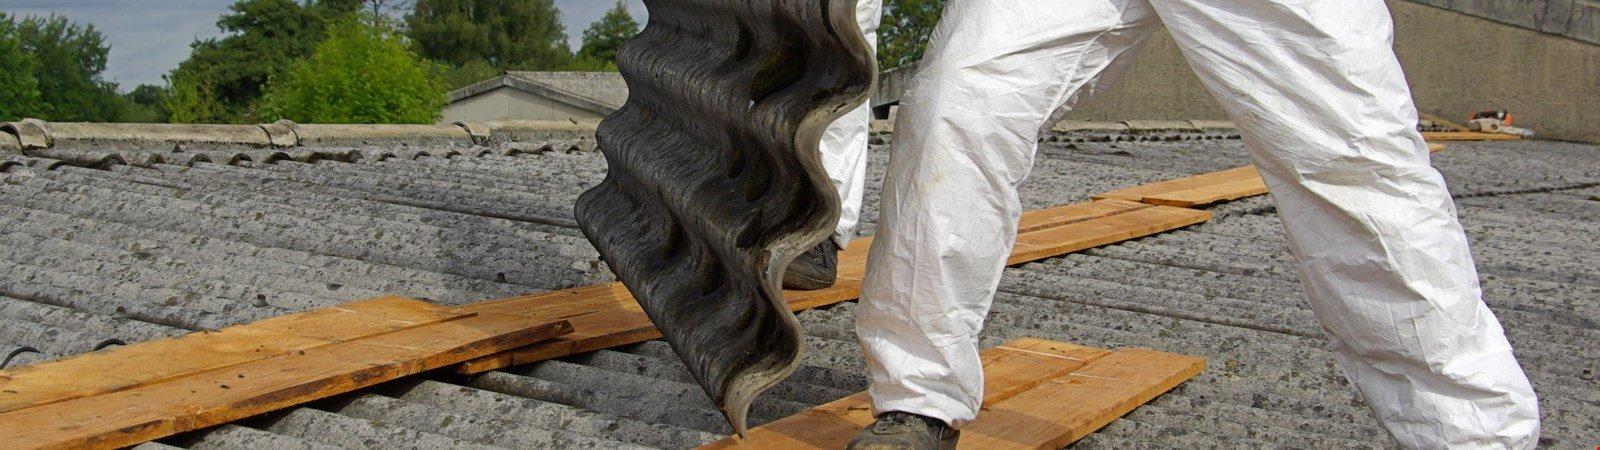 Asbest auf dem Dach